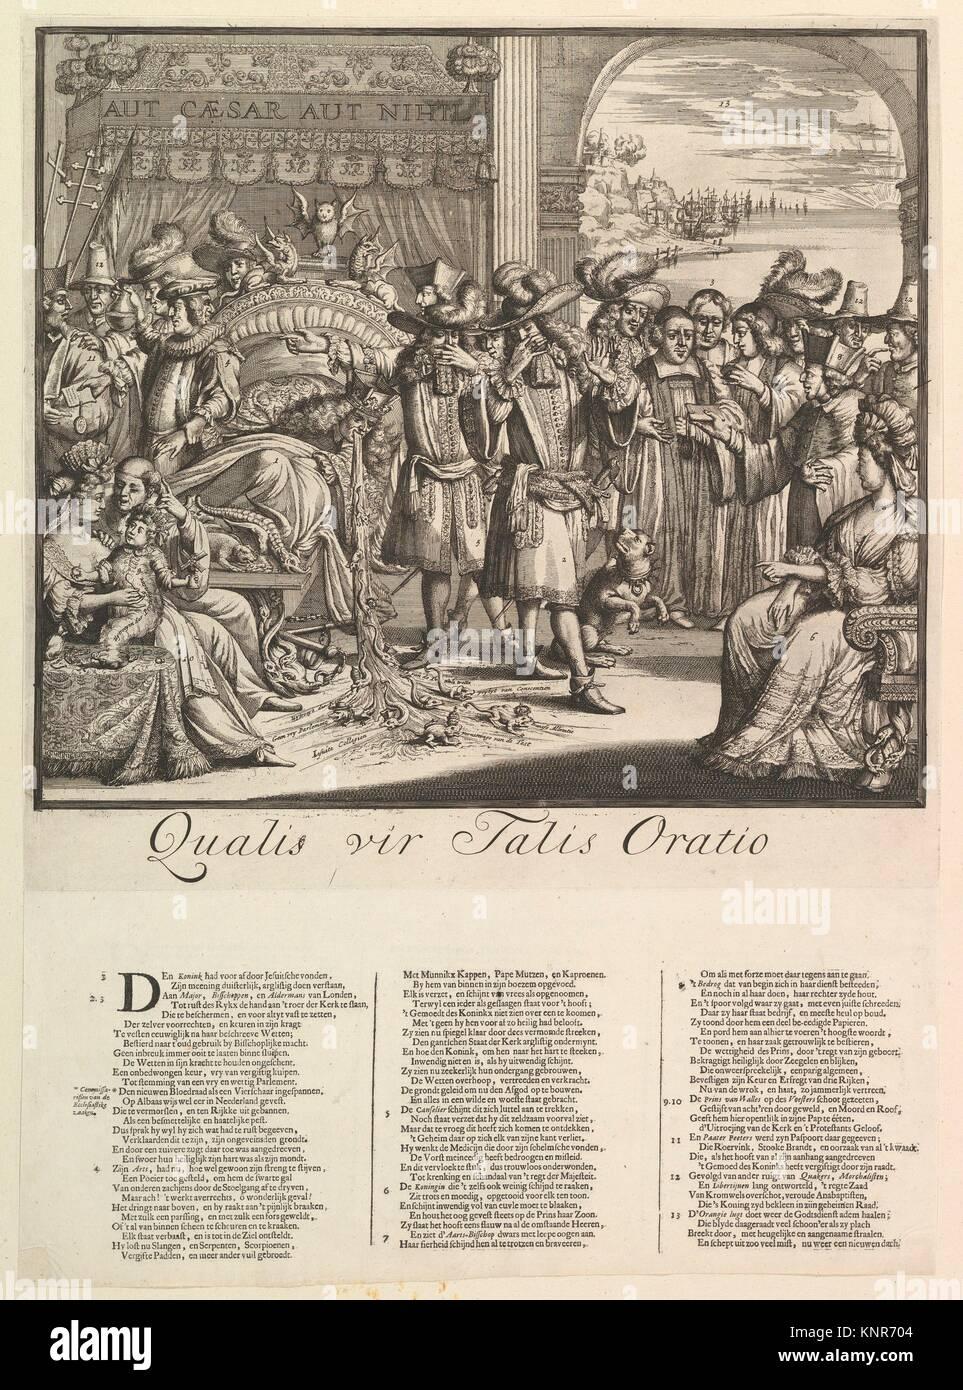 Qualis vir Talis Oratio. Artist: Romeyn de Hooghe (Dutch, 1645-1708); Date: n.d; Medium: Etching and letterpress; - Stock Image